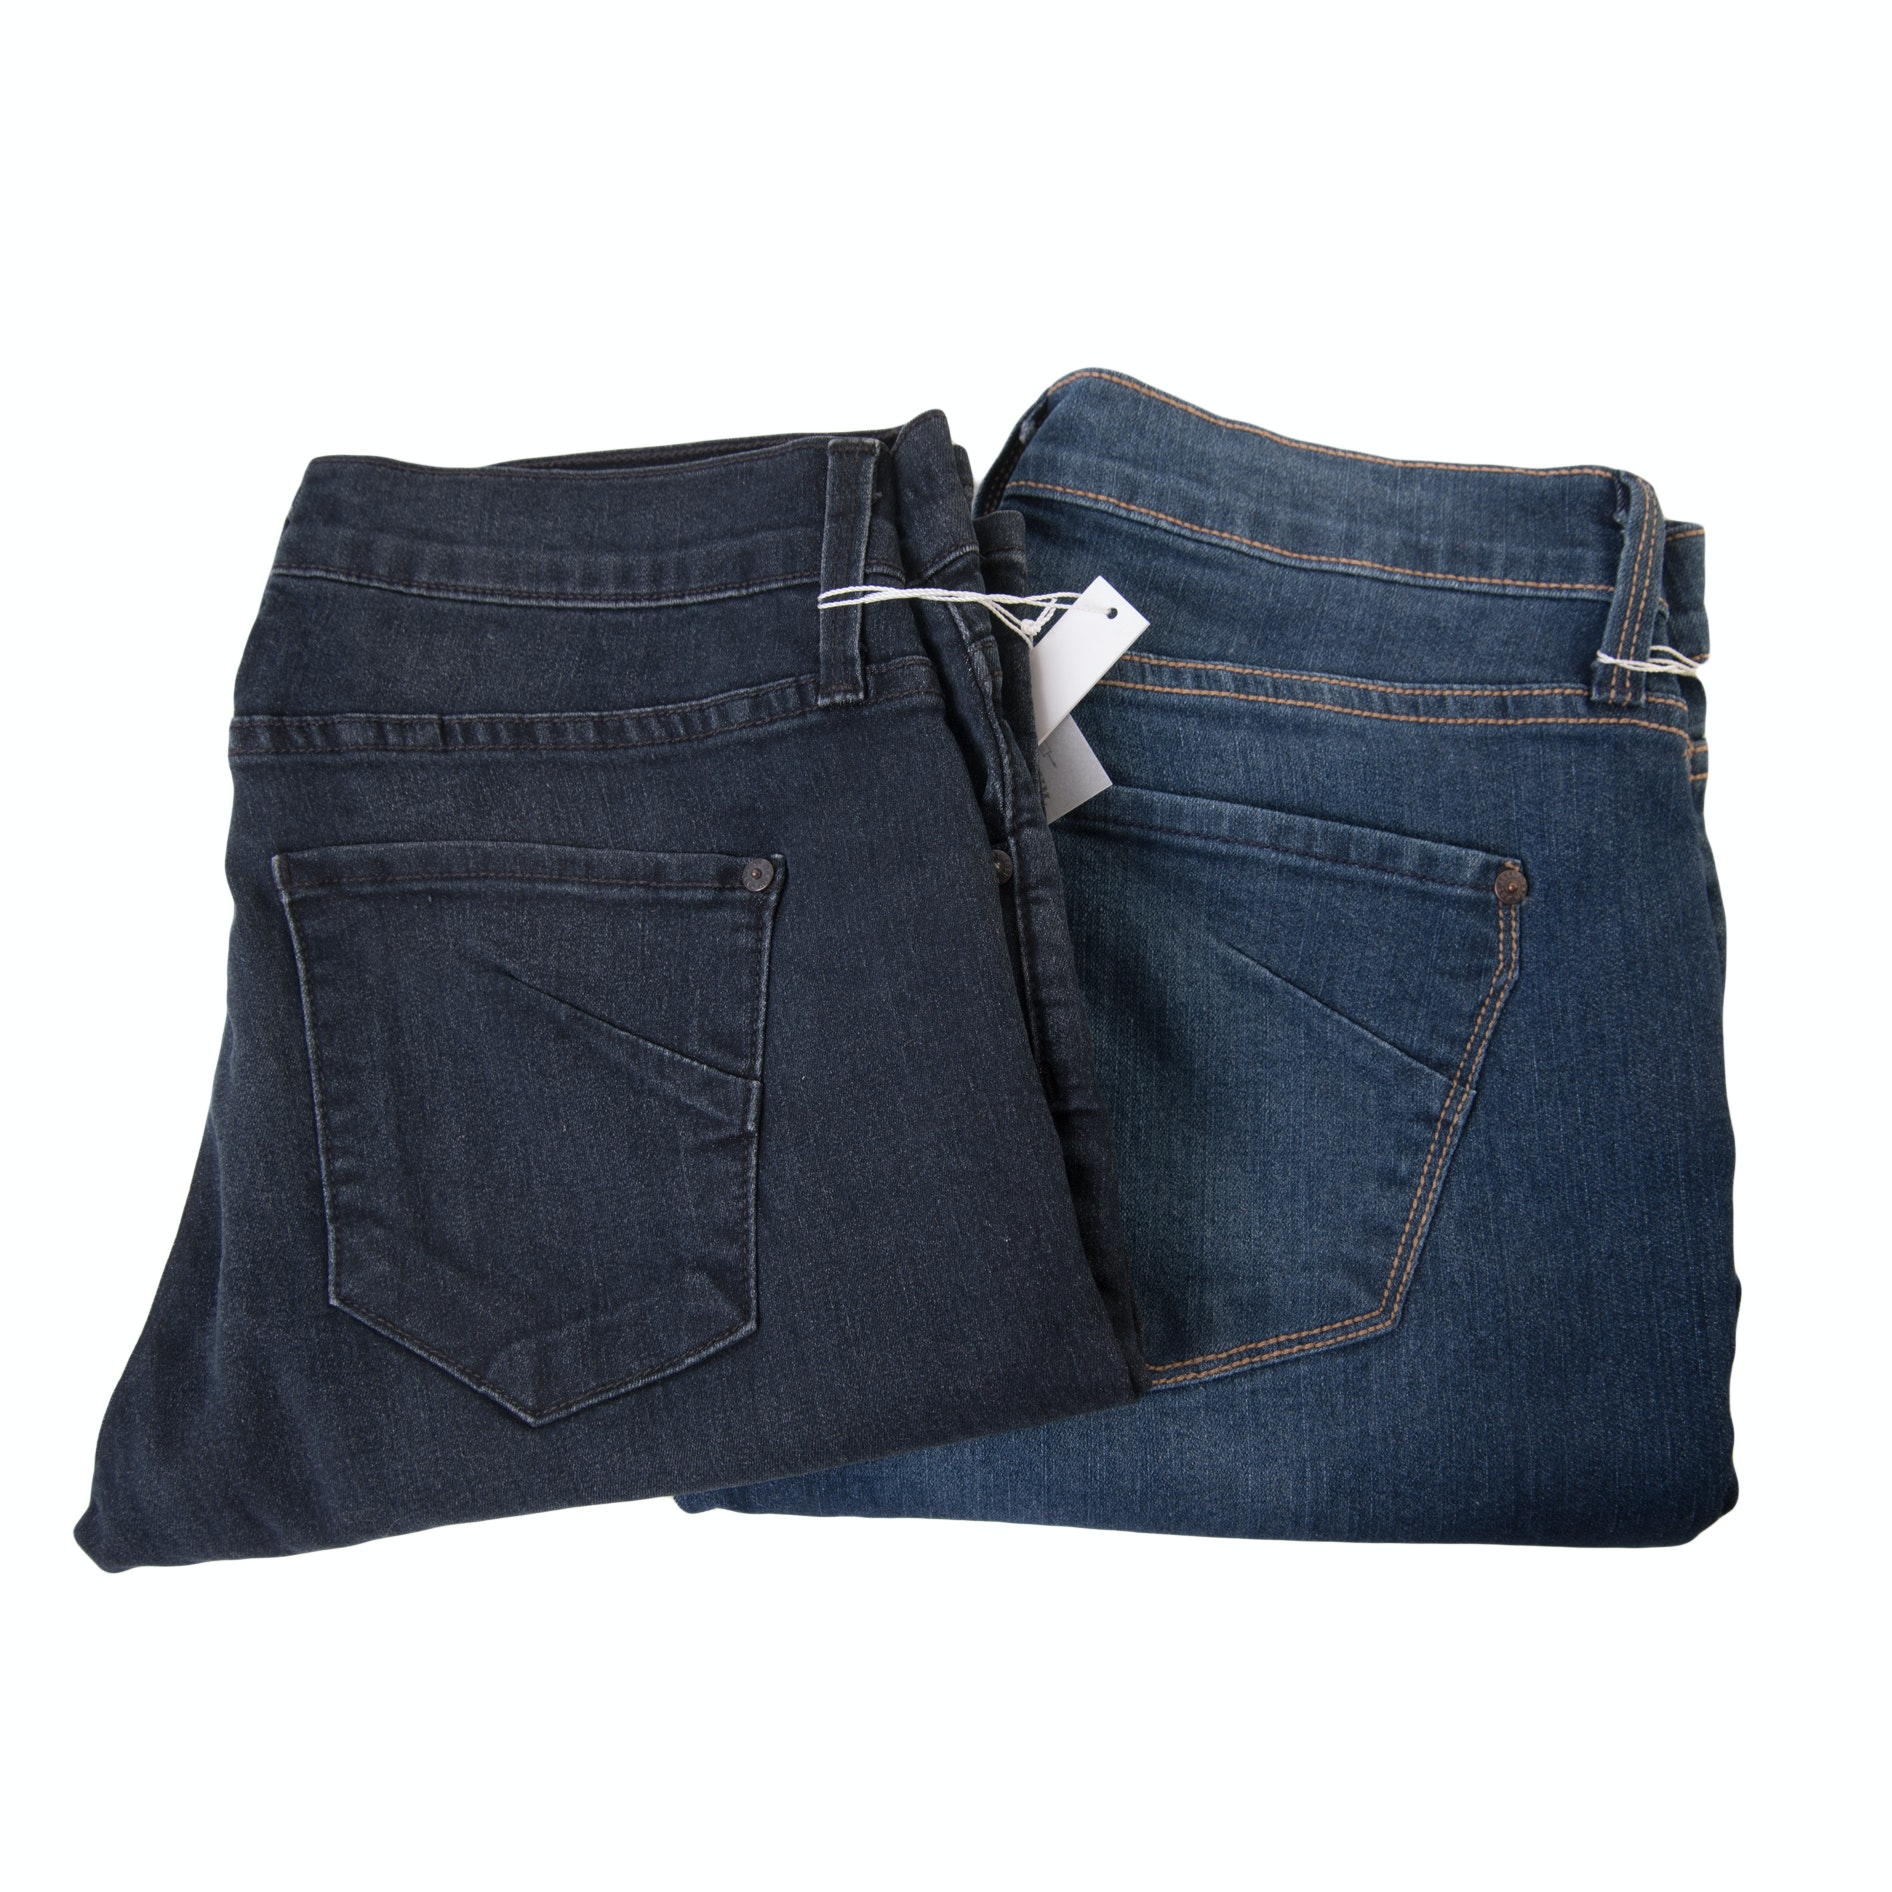 James Jeans Five Pocket Jean Leggings